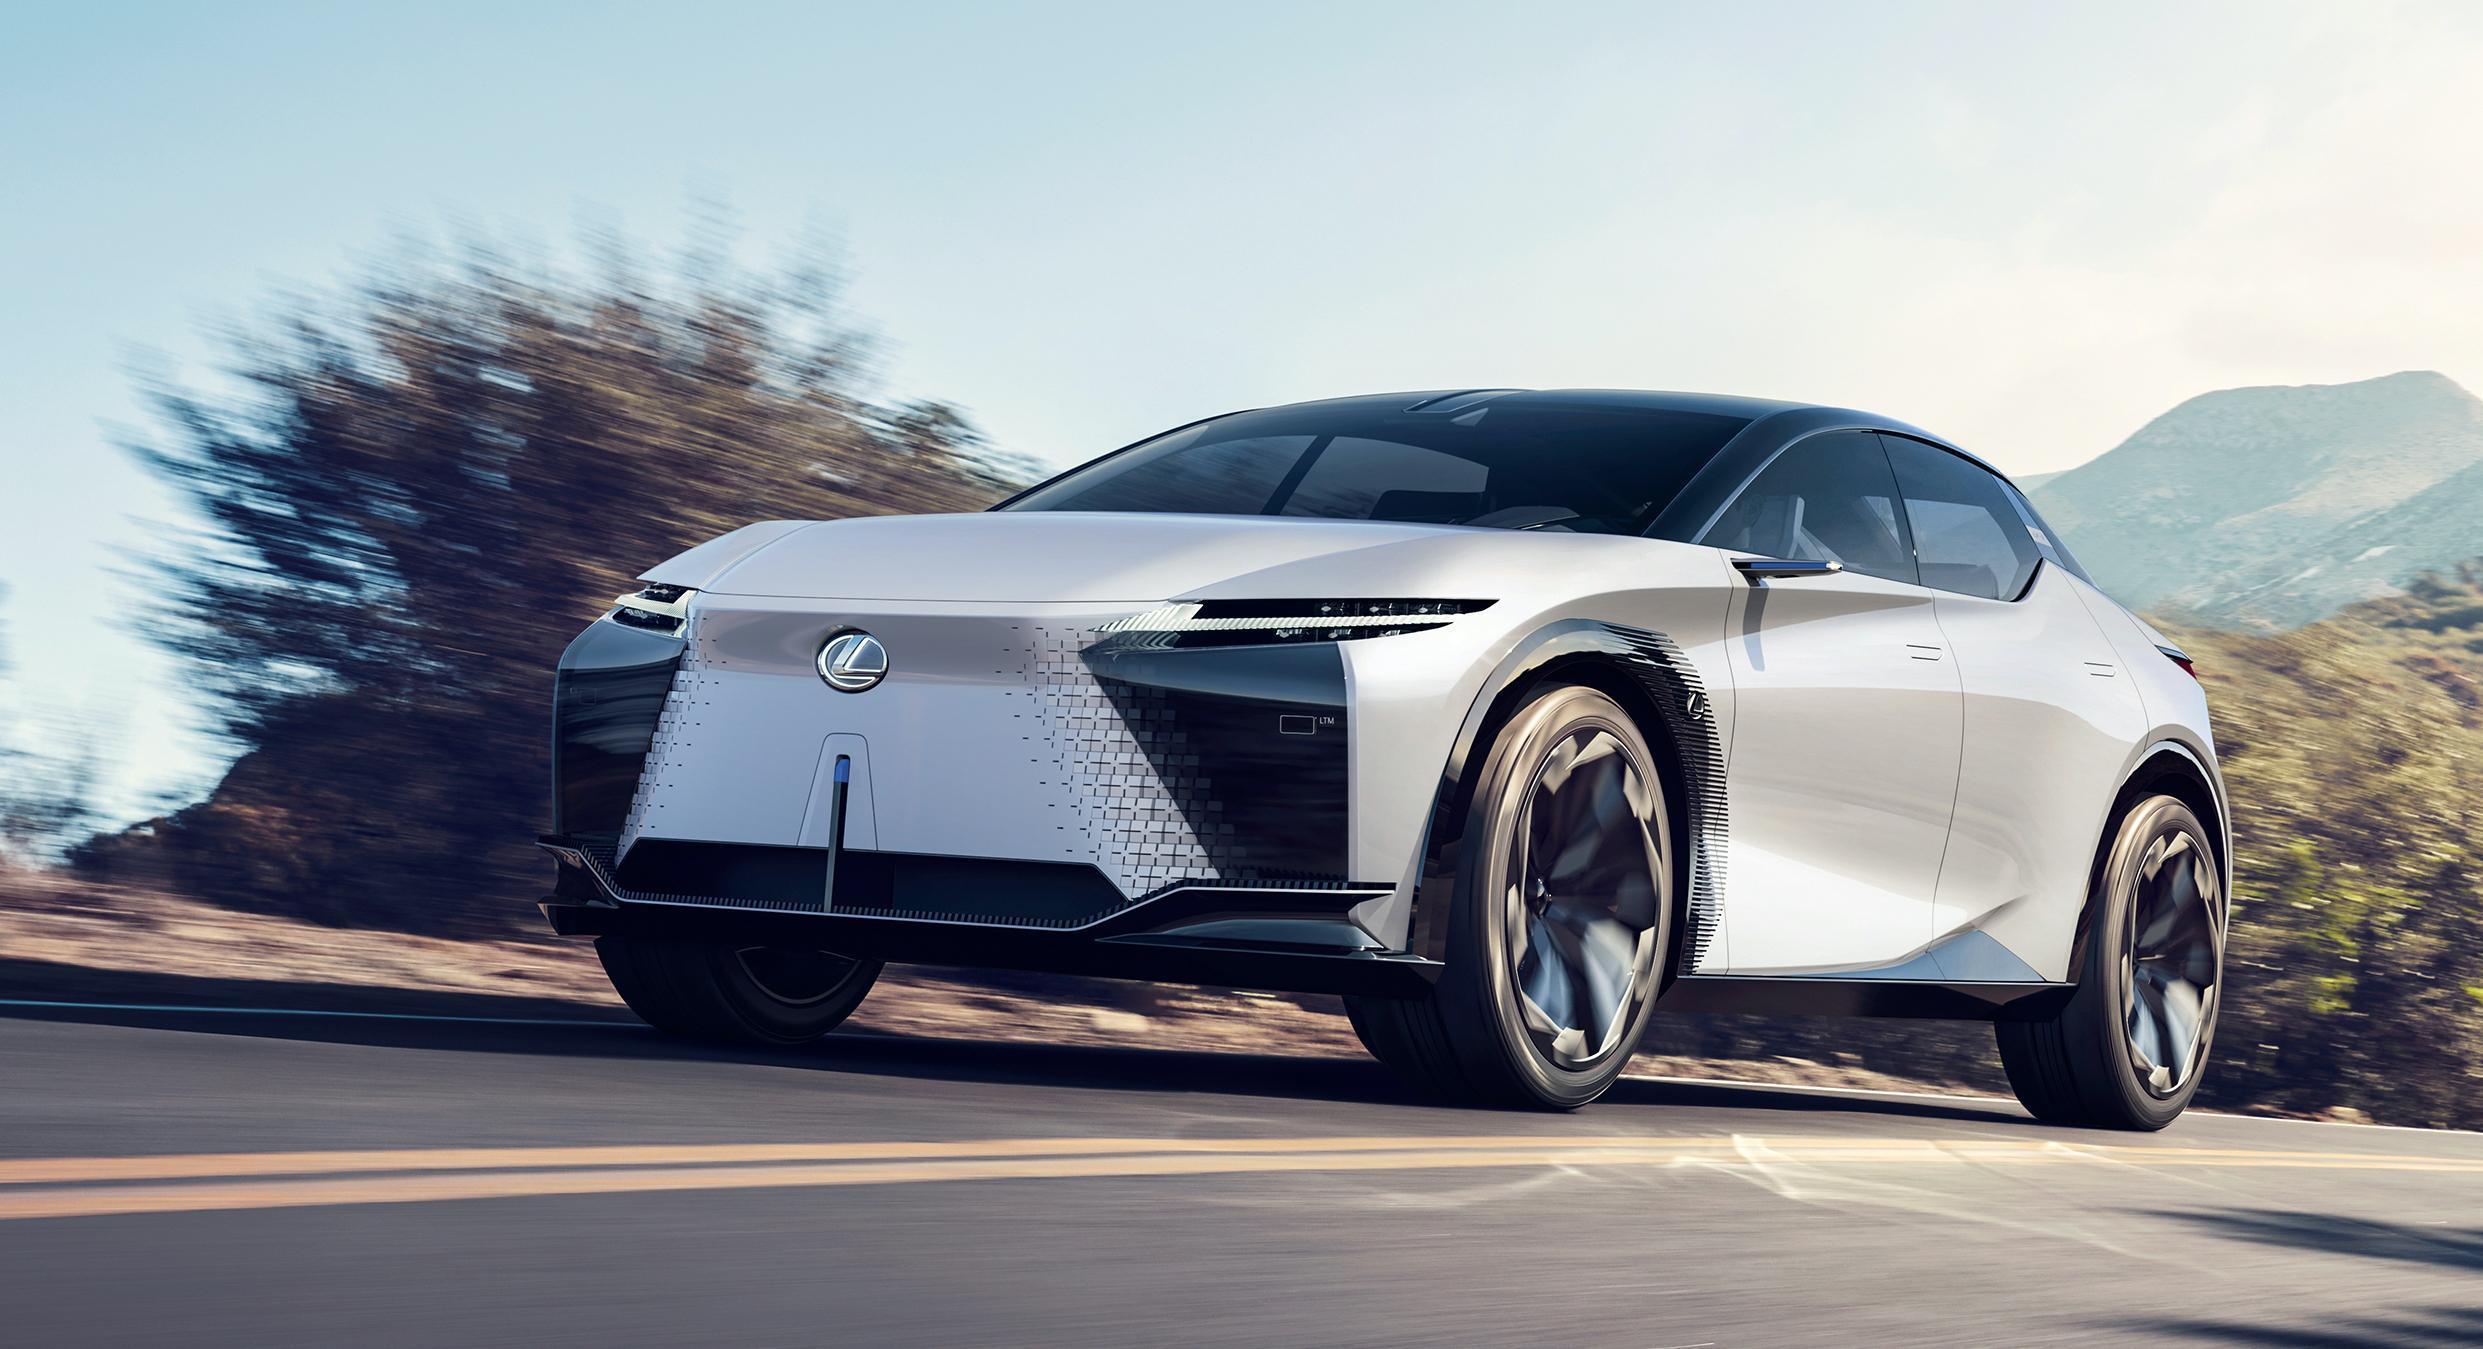 Lexus LF-Z Electrified – Ausblick in die Zukunft der Marke